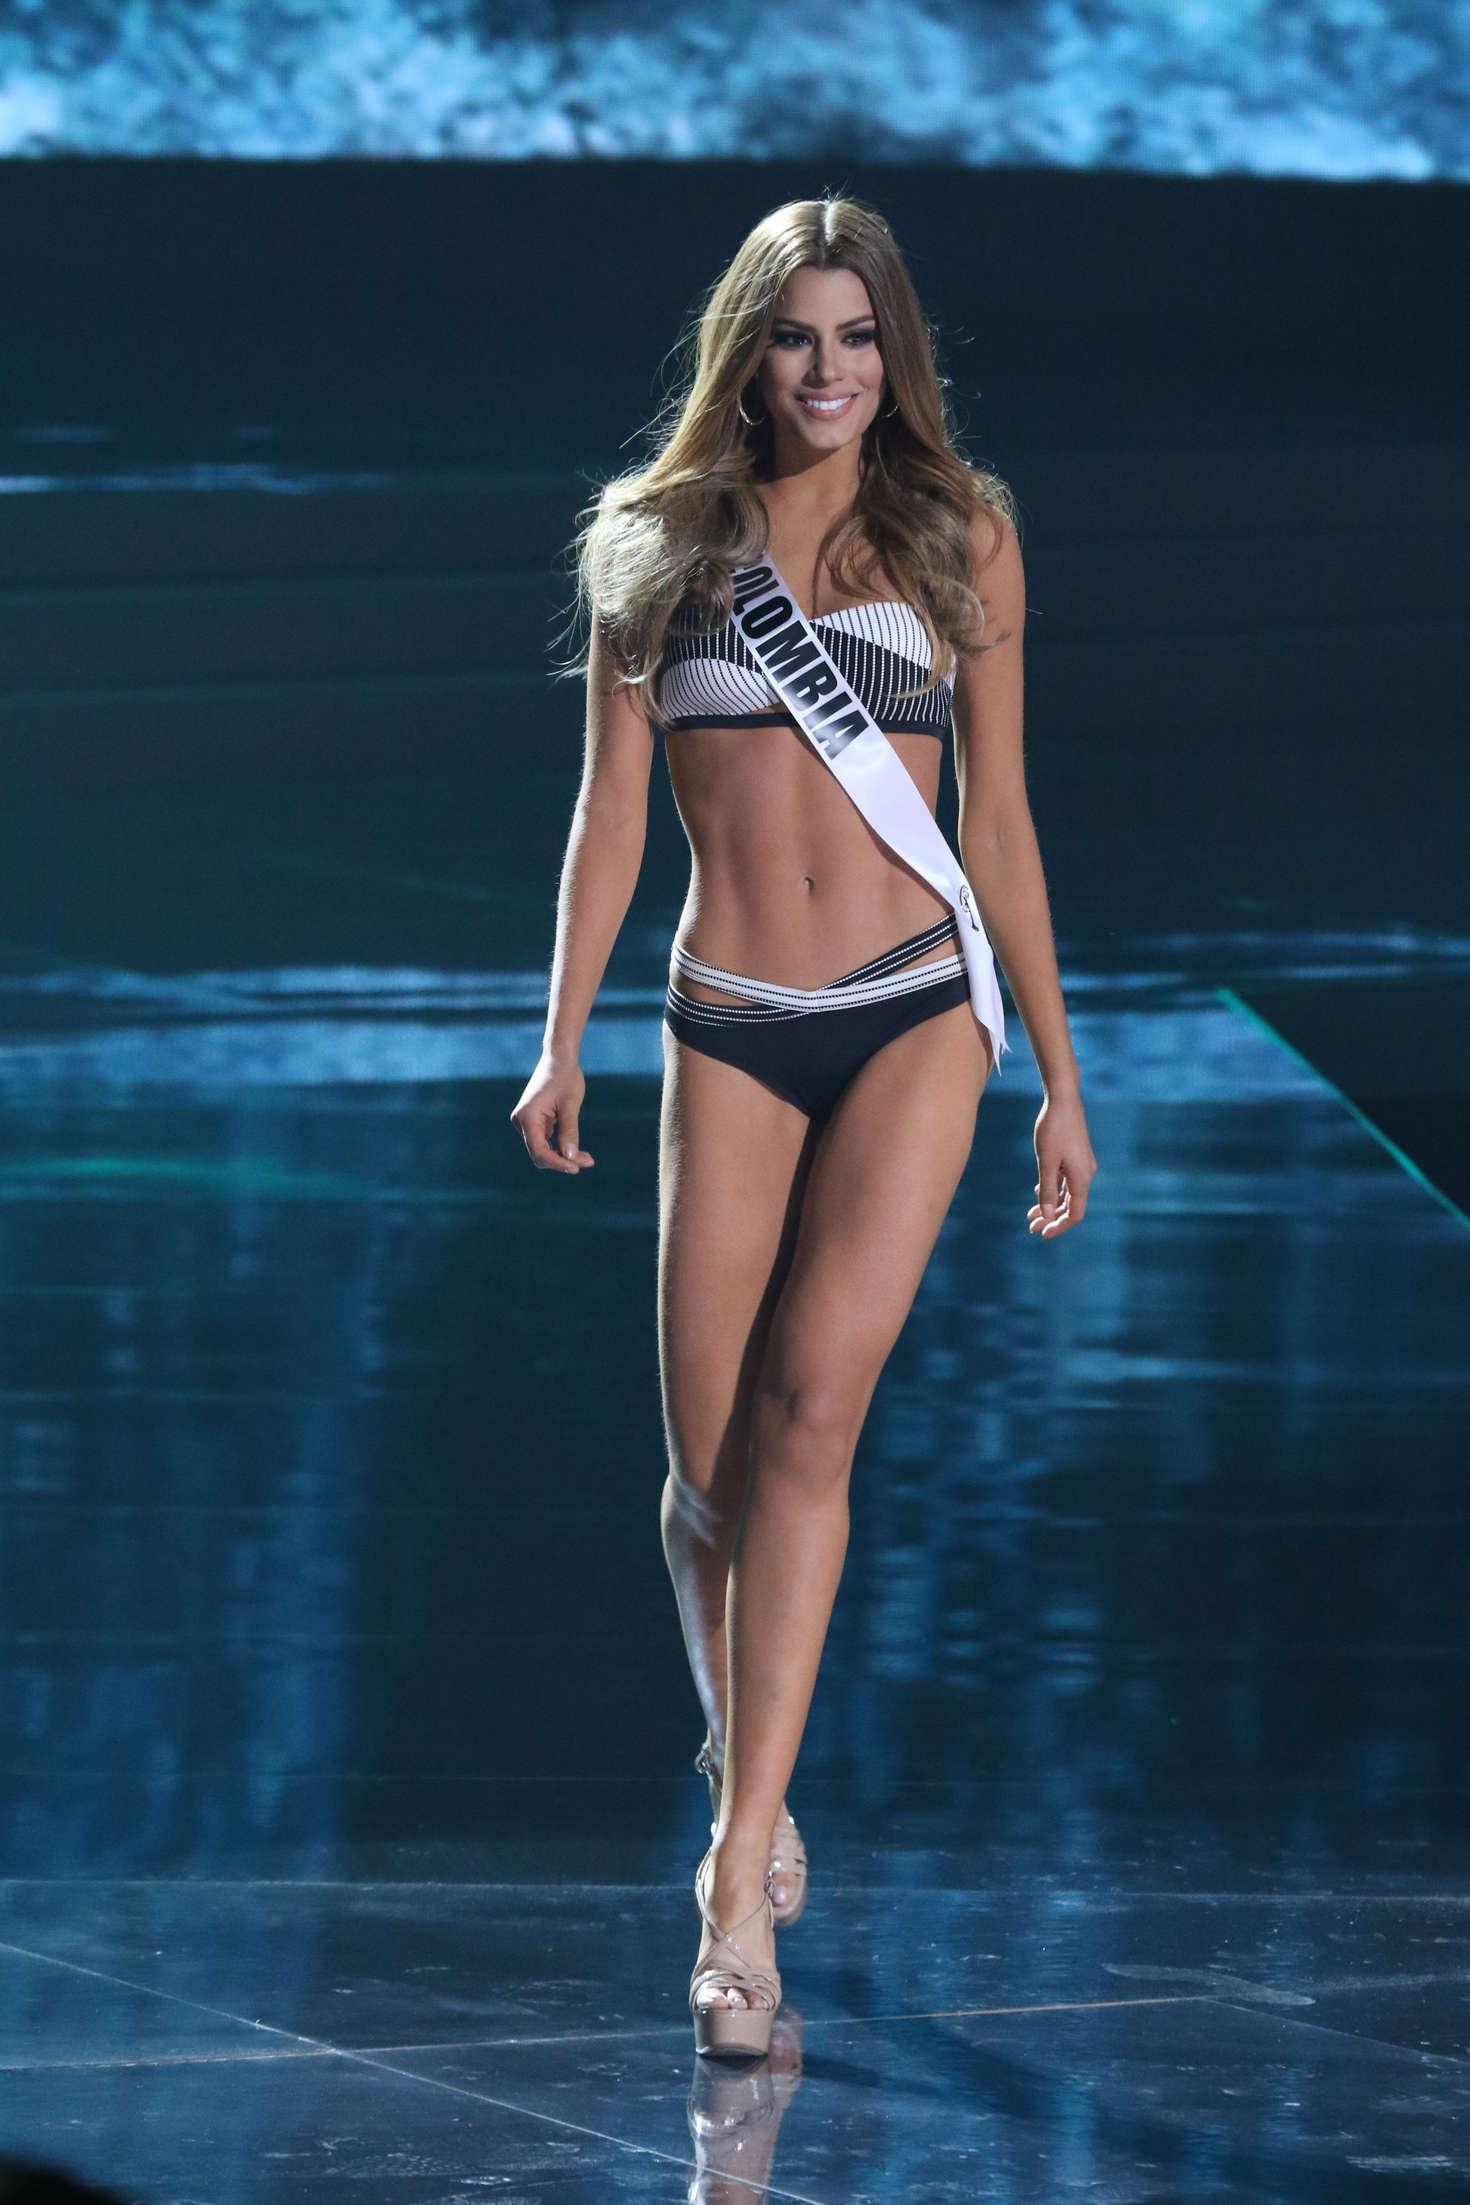 Ariadna Gutierrez Arevalo - Miss Universe 2015 Preliminary Round in Las Vegas